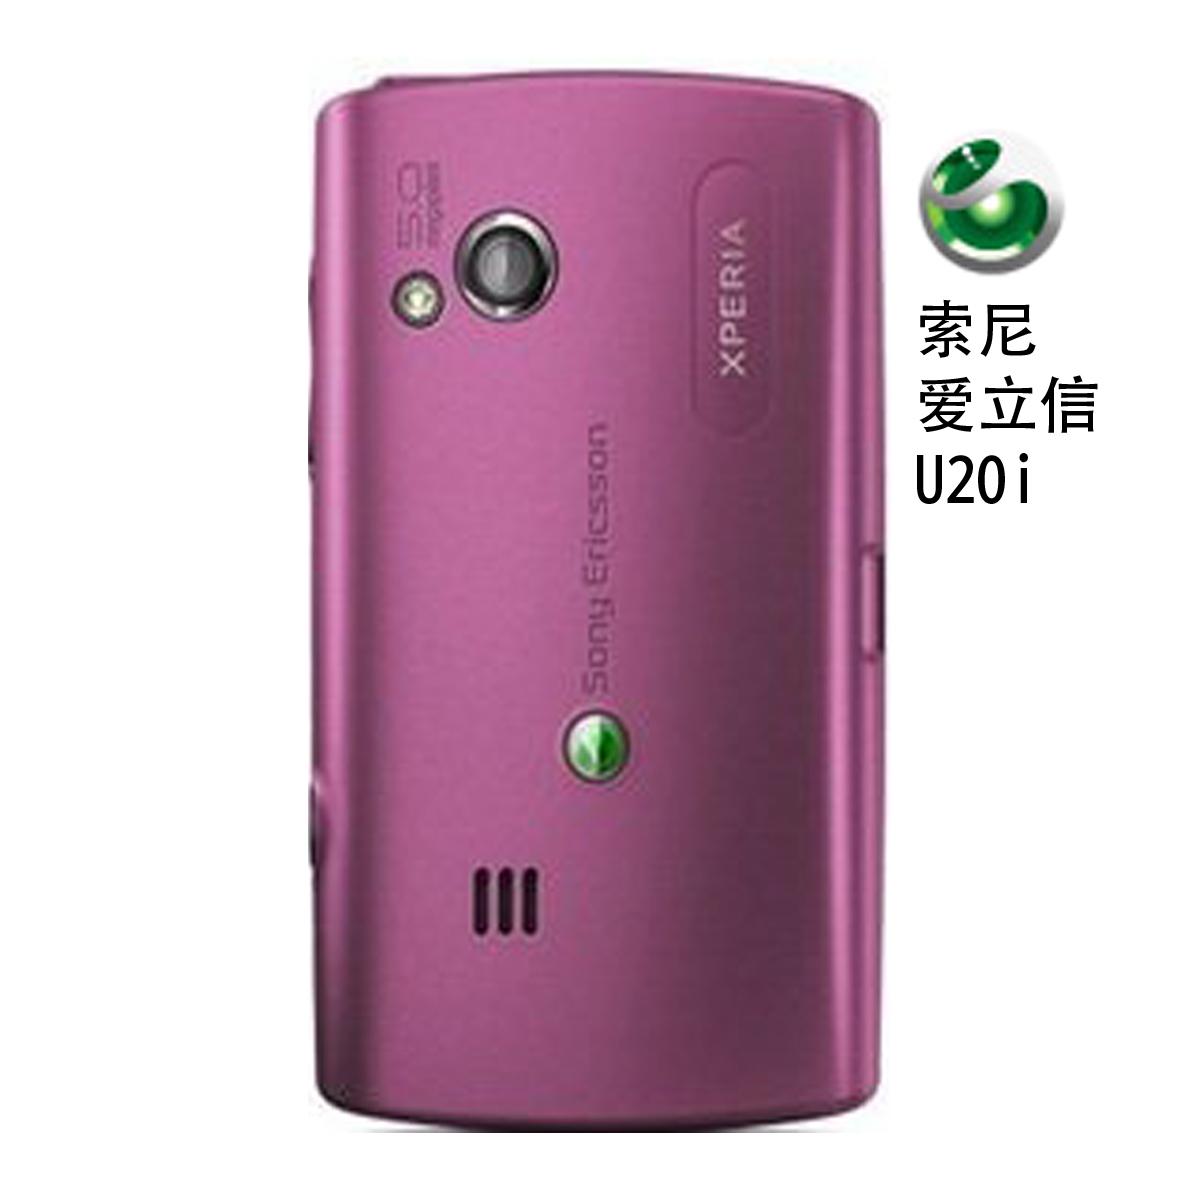 Мобильный телефон Sony Ericsson  U20i/X10mini Pro